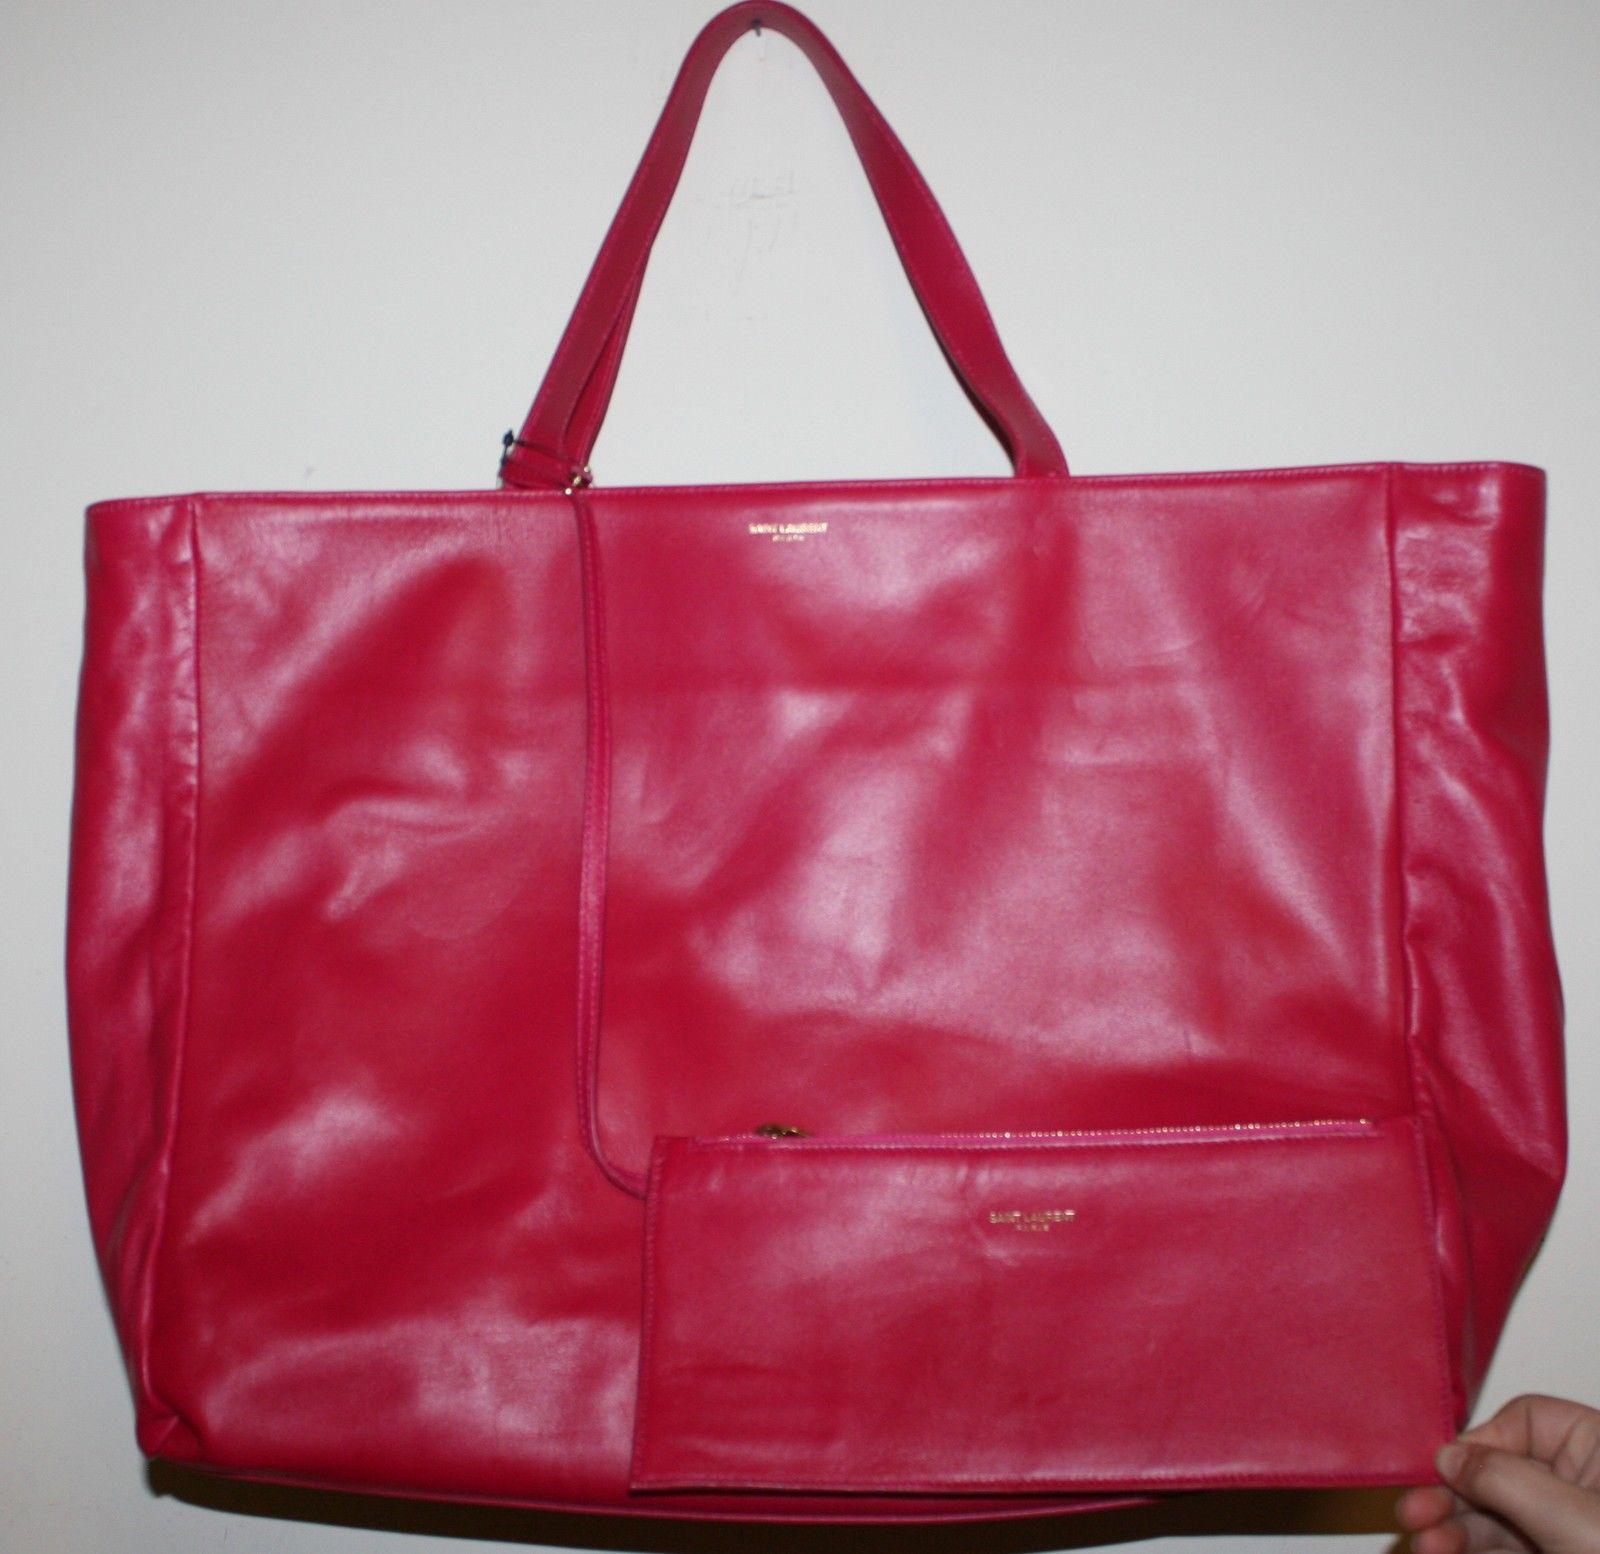 Yves Saint Laurent Handbags | Ysl Wallet | Saint Laurent Monogram Shoulder Bag